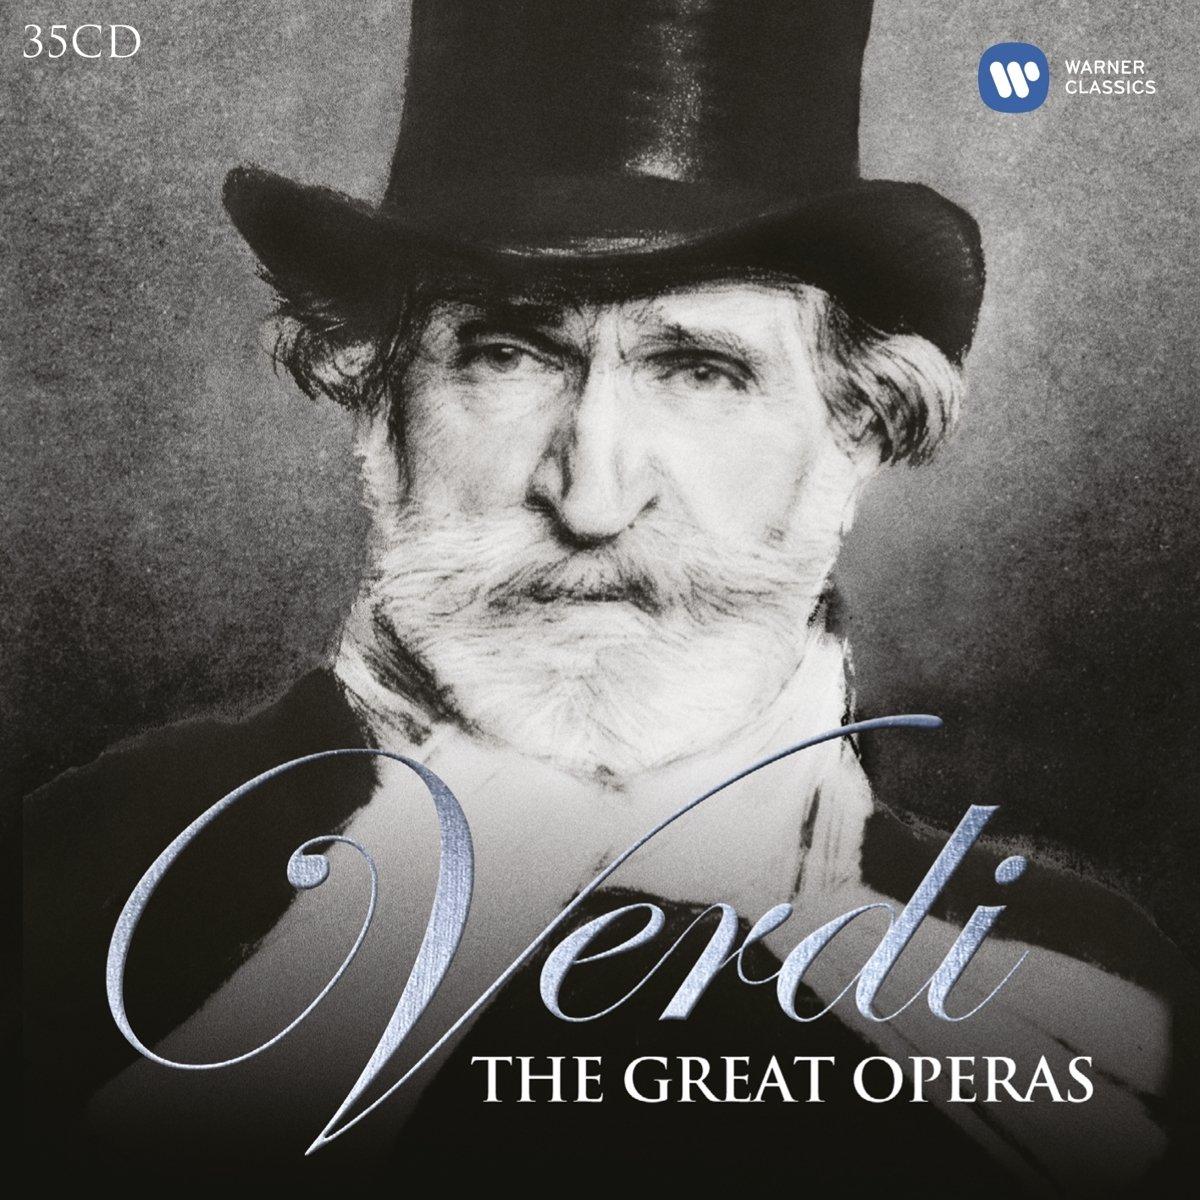 Verdi  The Great Operas  Amazon.co.uk  Music db3b9dba0090